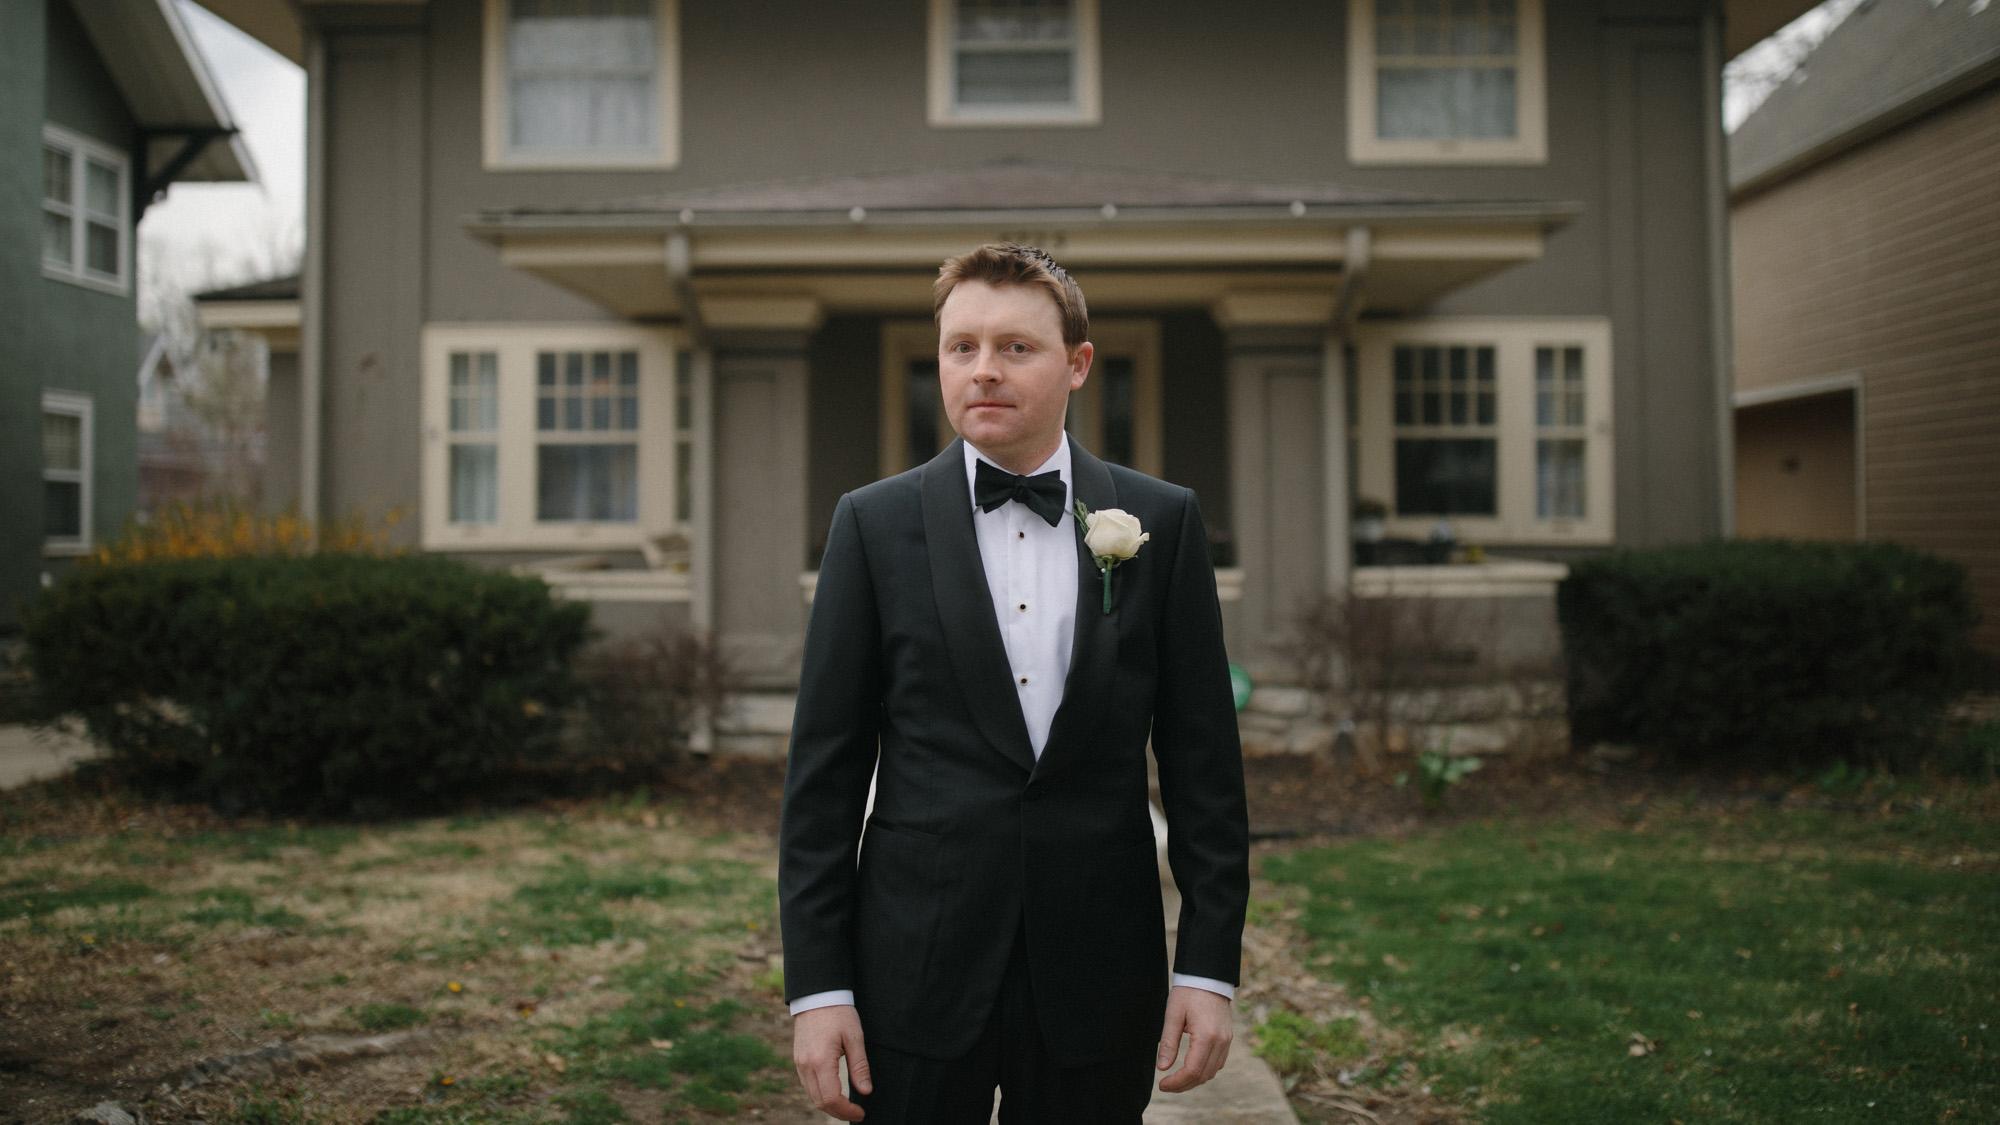 Alec_Vanderboom_kansas_city_hip_wedding_photos-0024.jpg